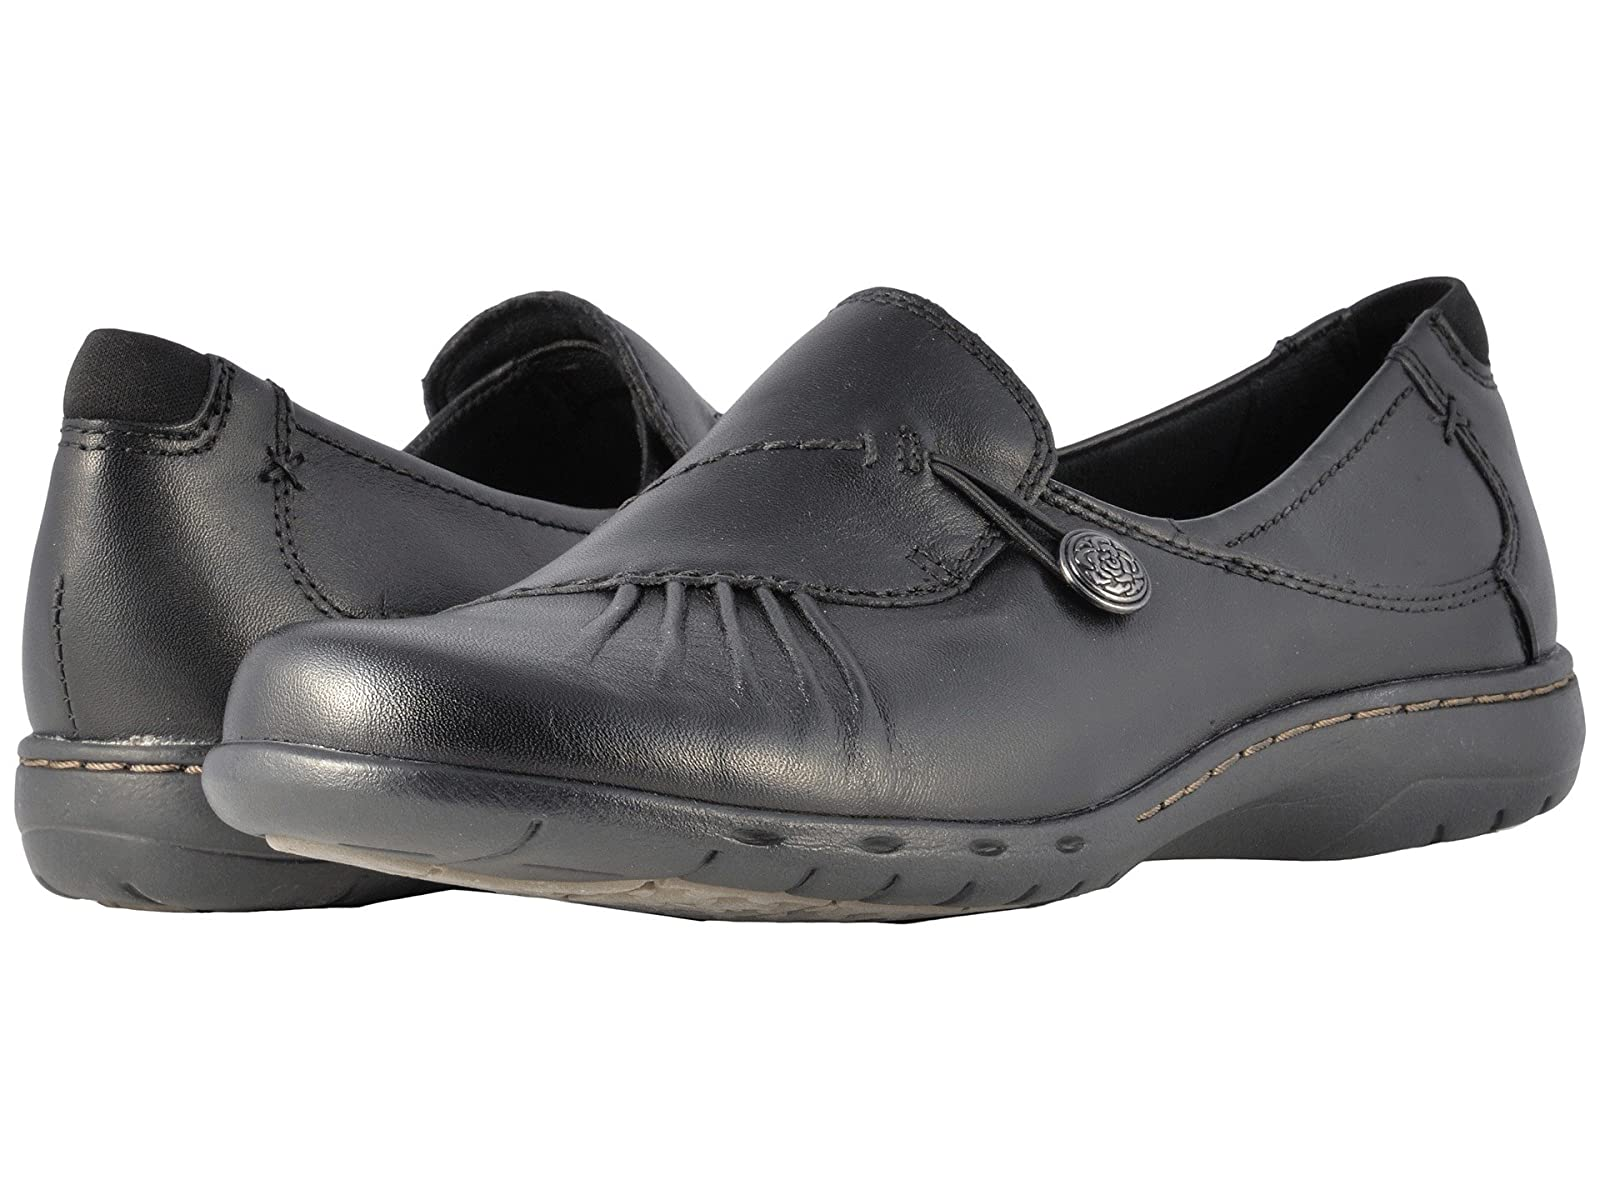 Rockport Cobb Hill Collection Cobb Hill PauletteAtmospheric grades have affordable shoes